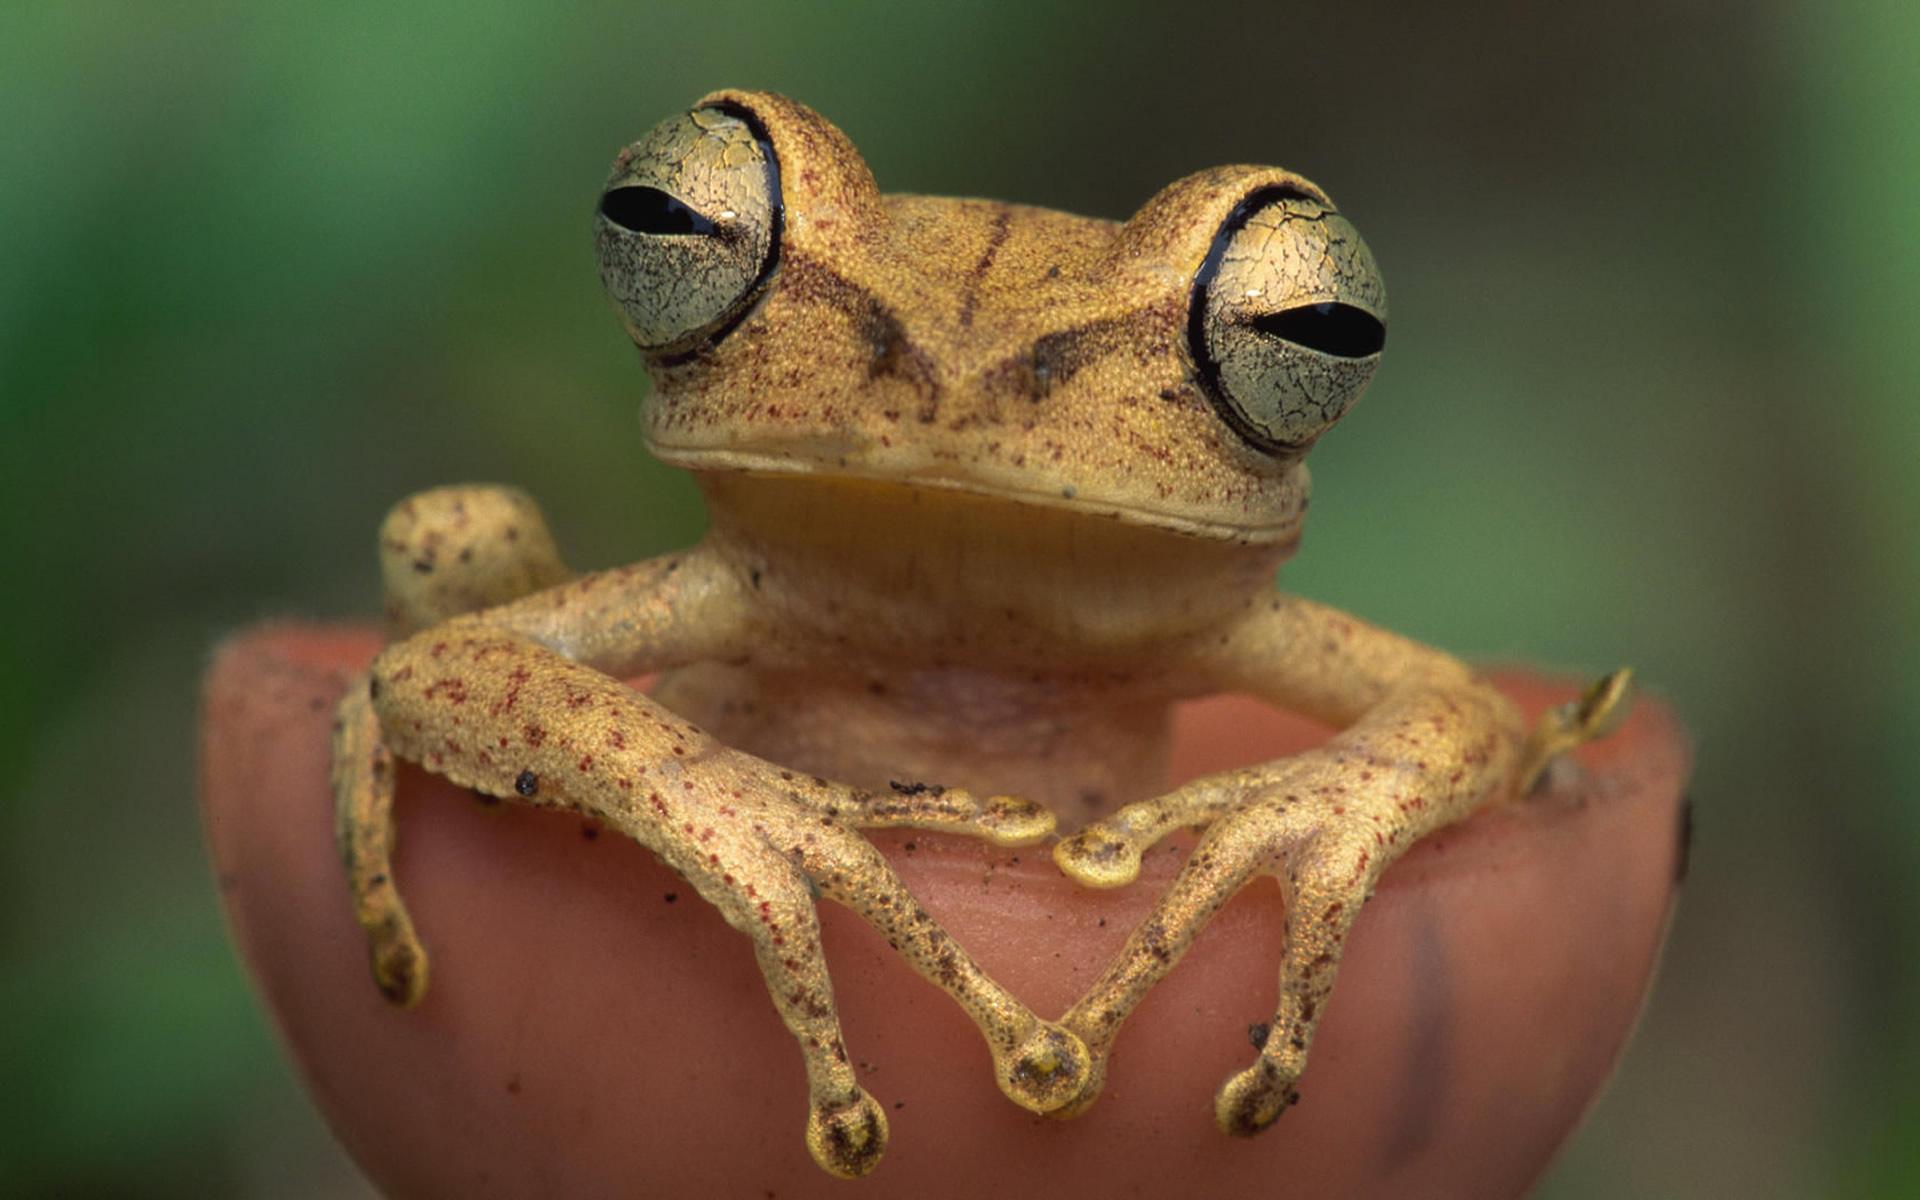 frog cute desktop background